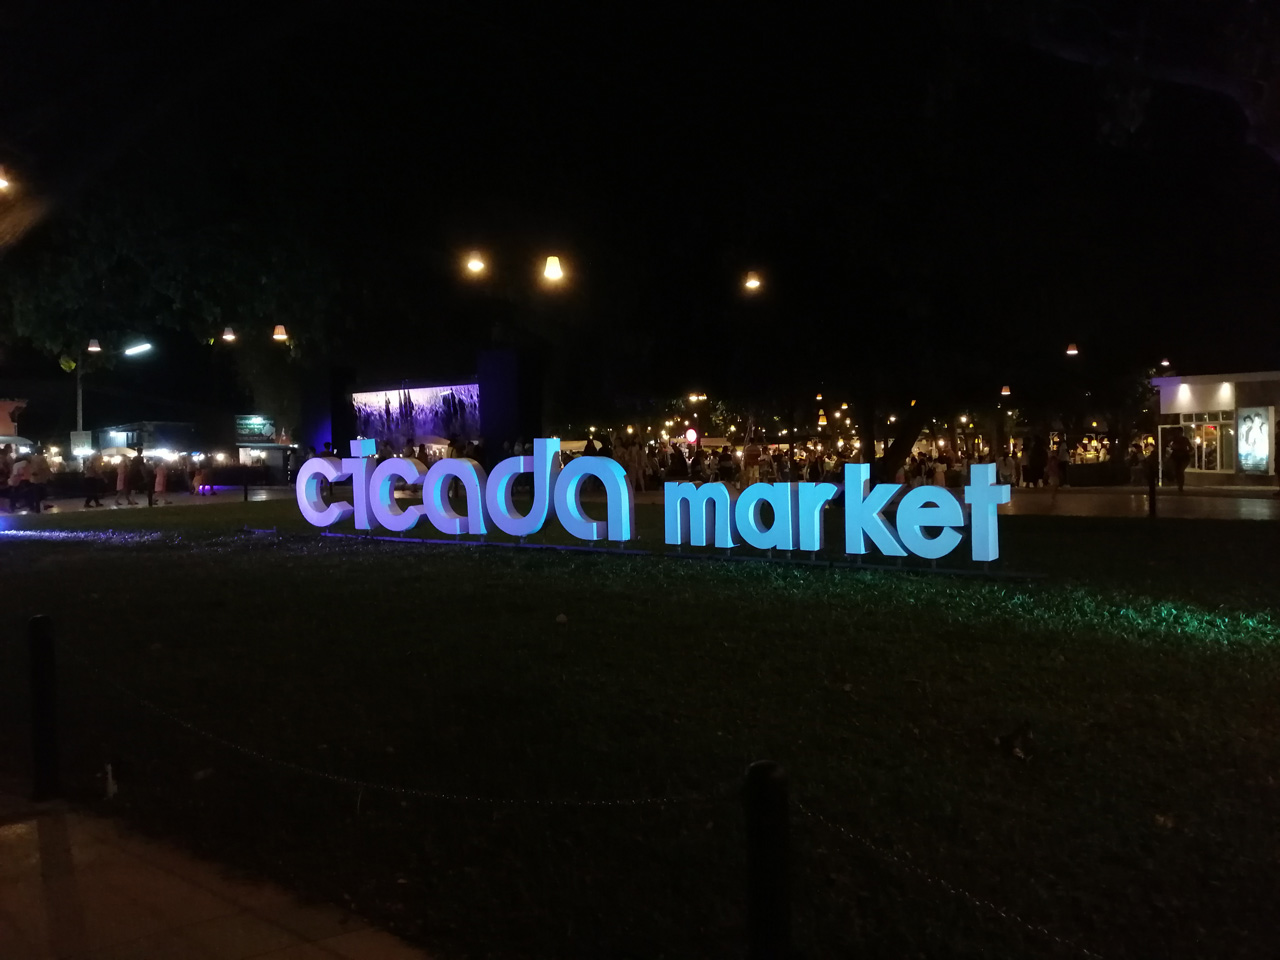 cicada market hua hin 1